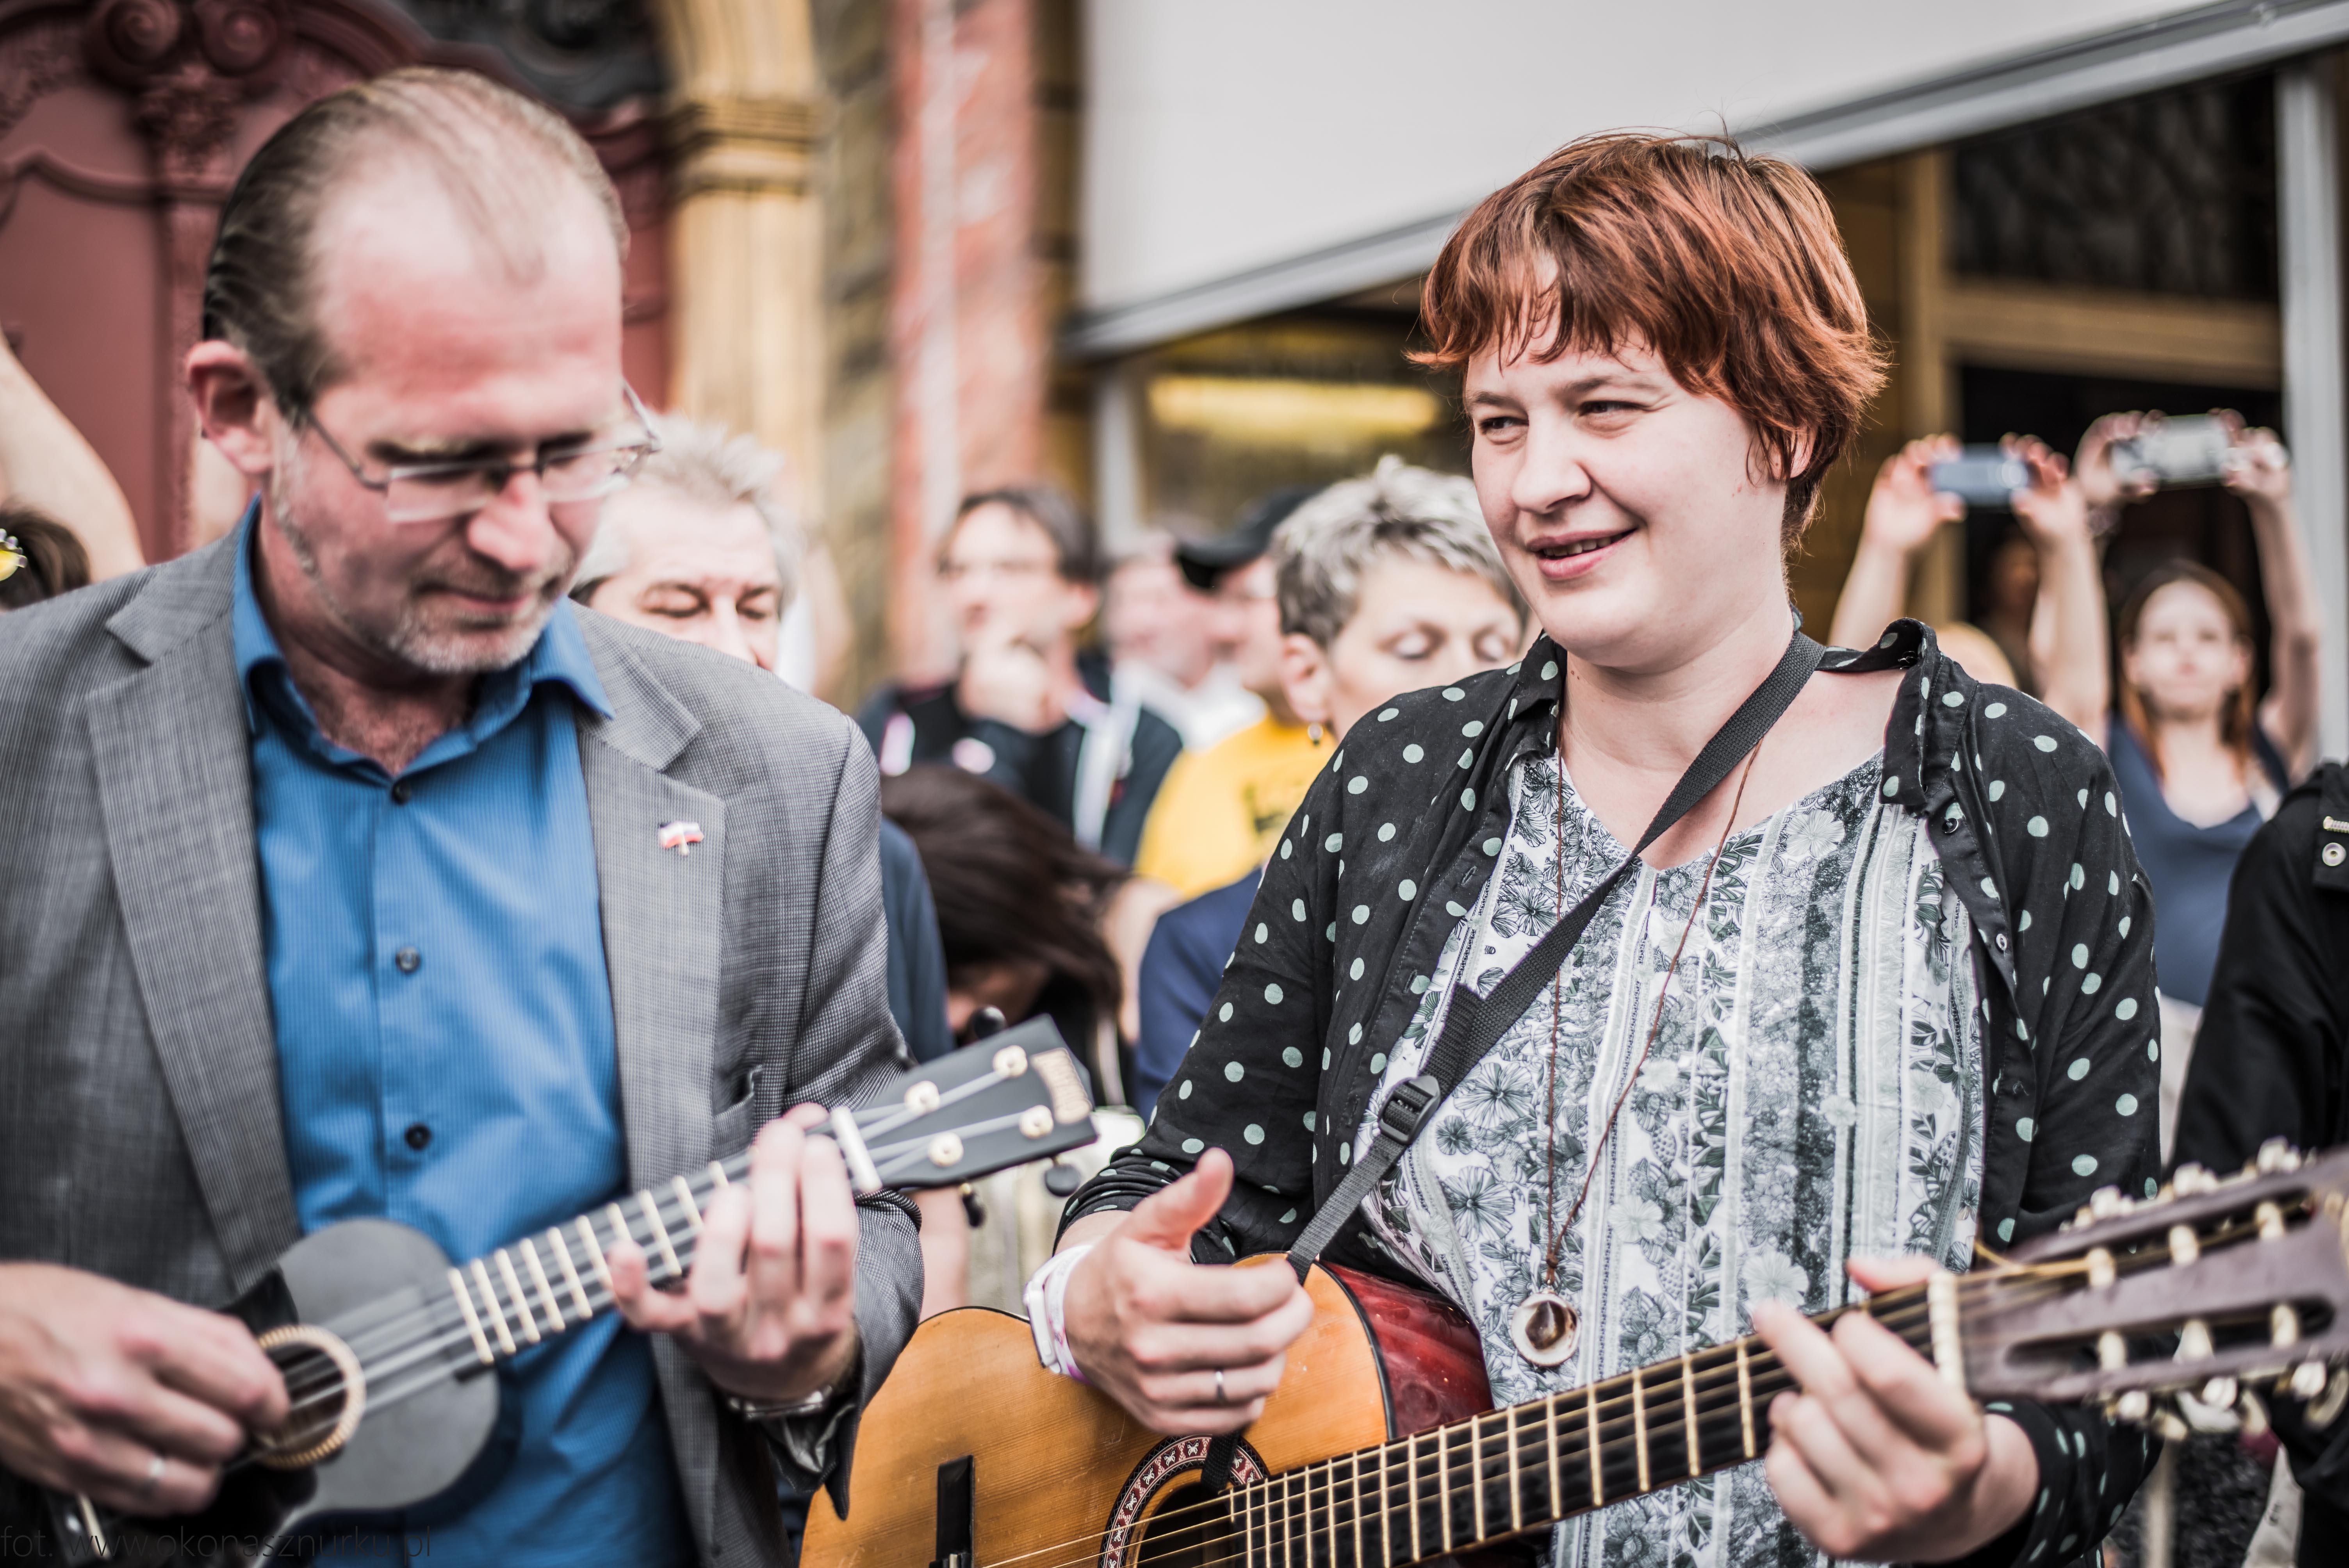 wroclawski-gitarowy-rekord-guinnessa-2018 (16)